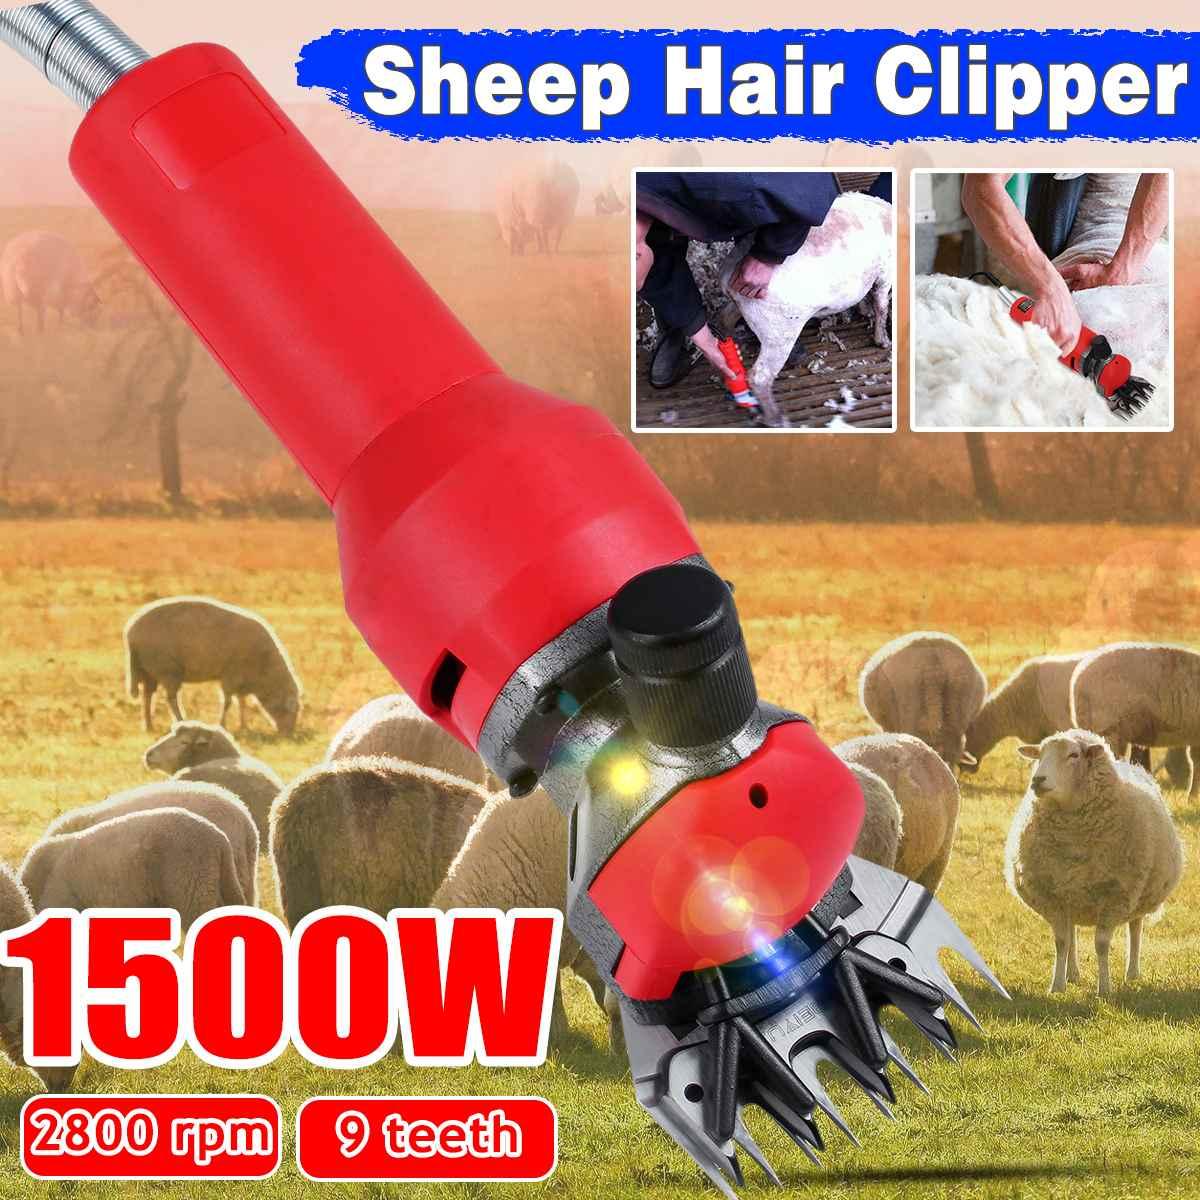 1500W 220V-240V Electric Sheep Pet Hair Clipper Shearing Kit 2800rmp Shear Wool Cut Goat Animal Shearing Supply Farm Cut Machine